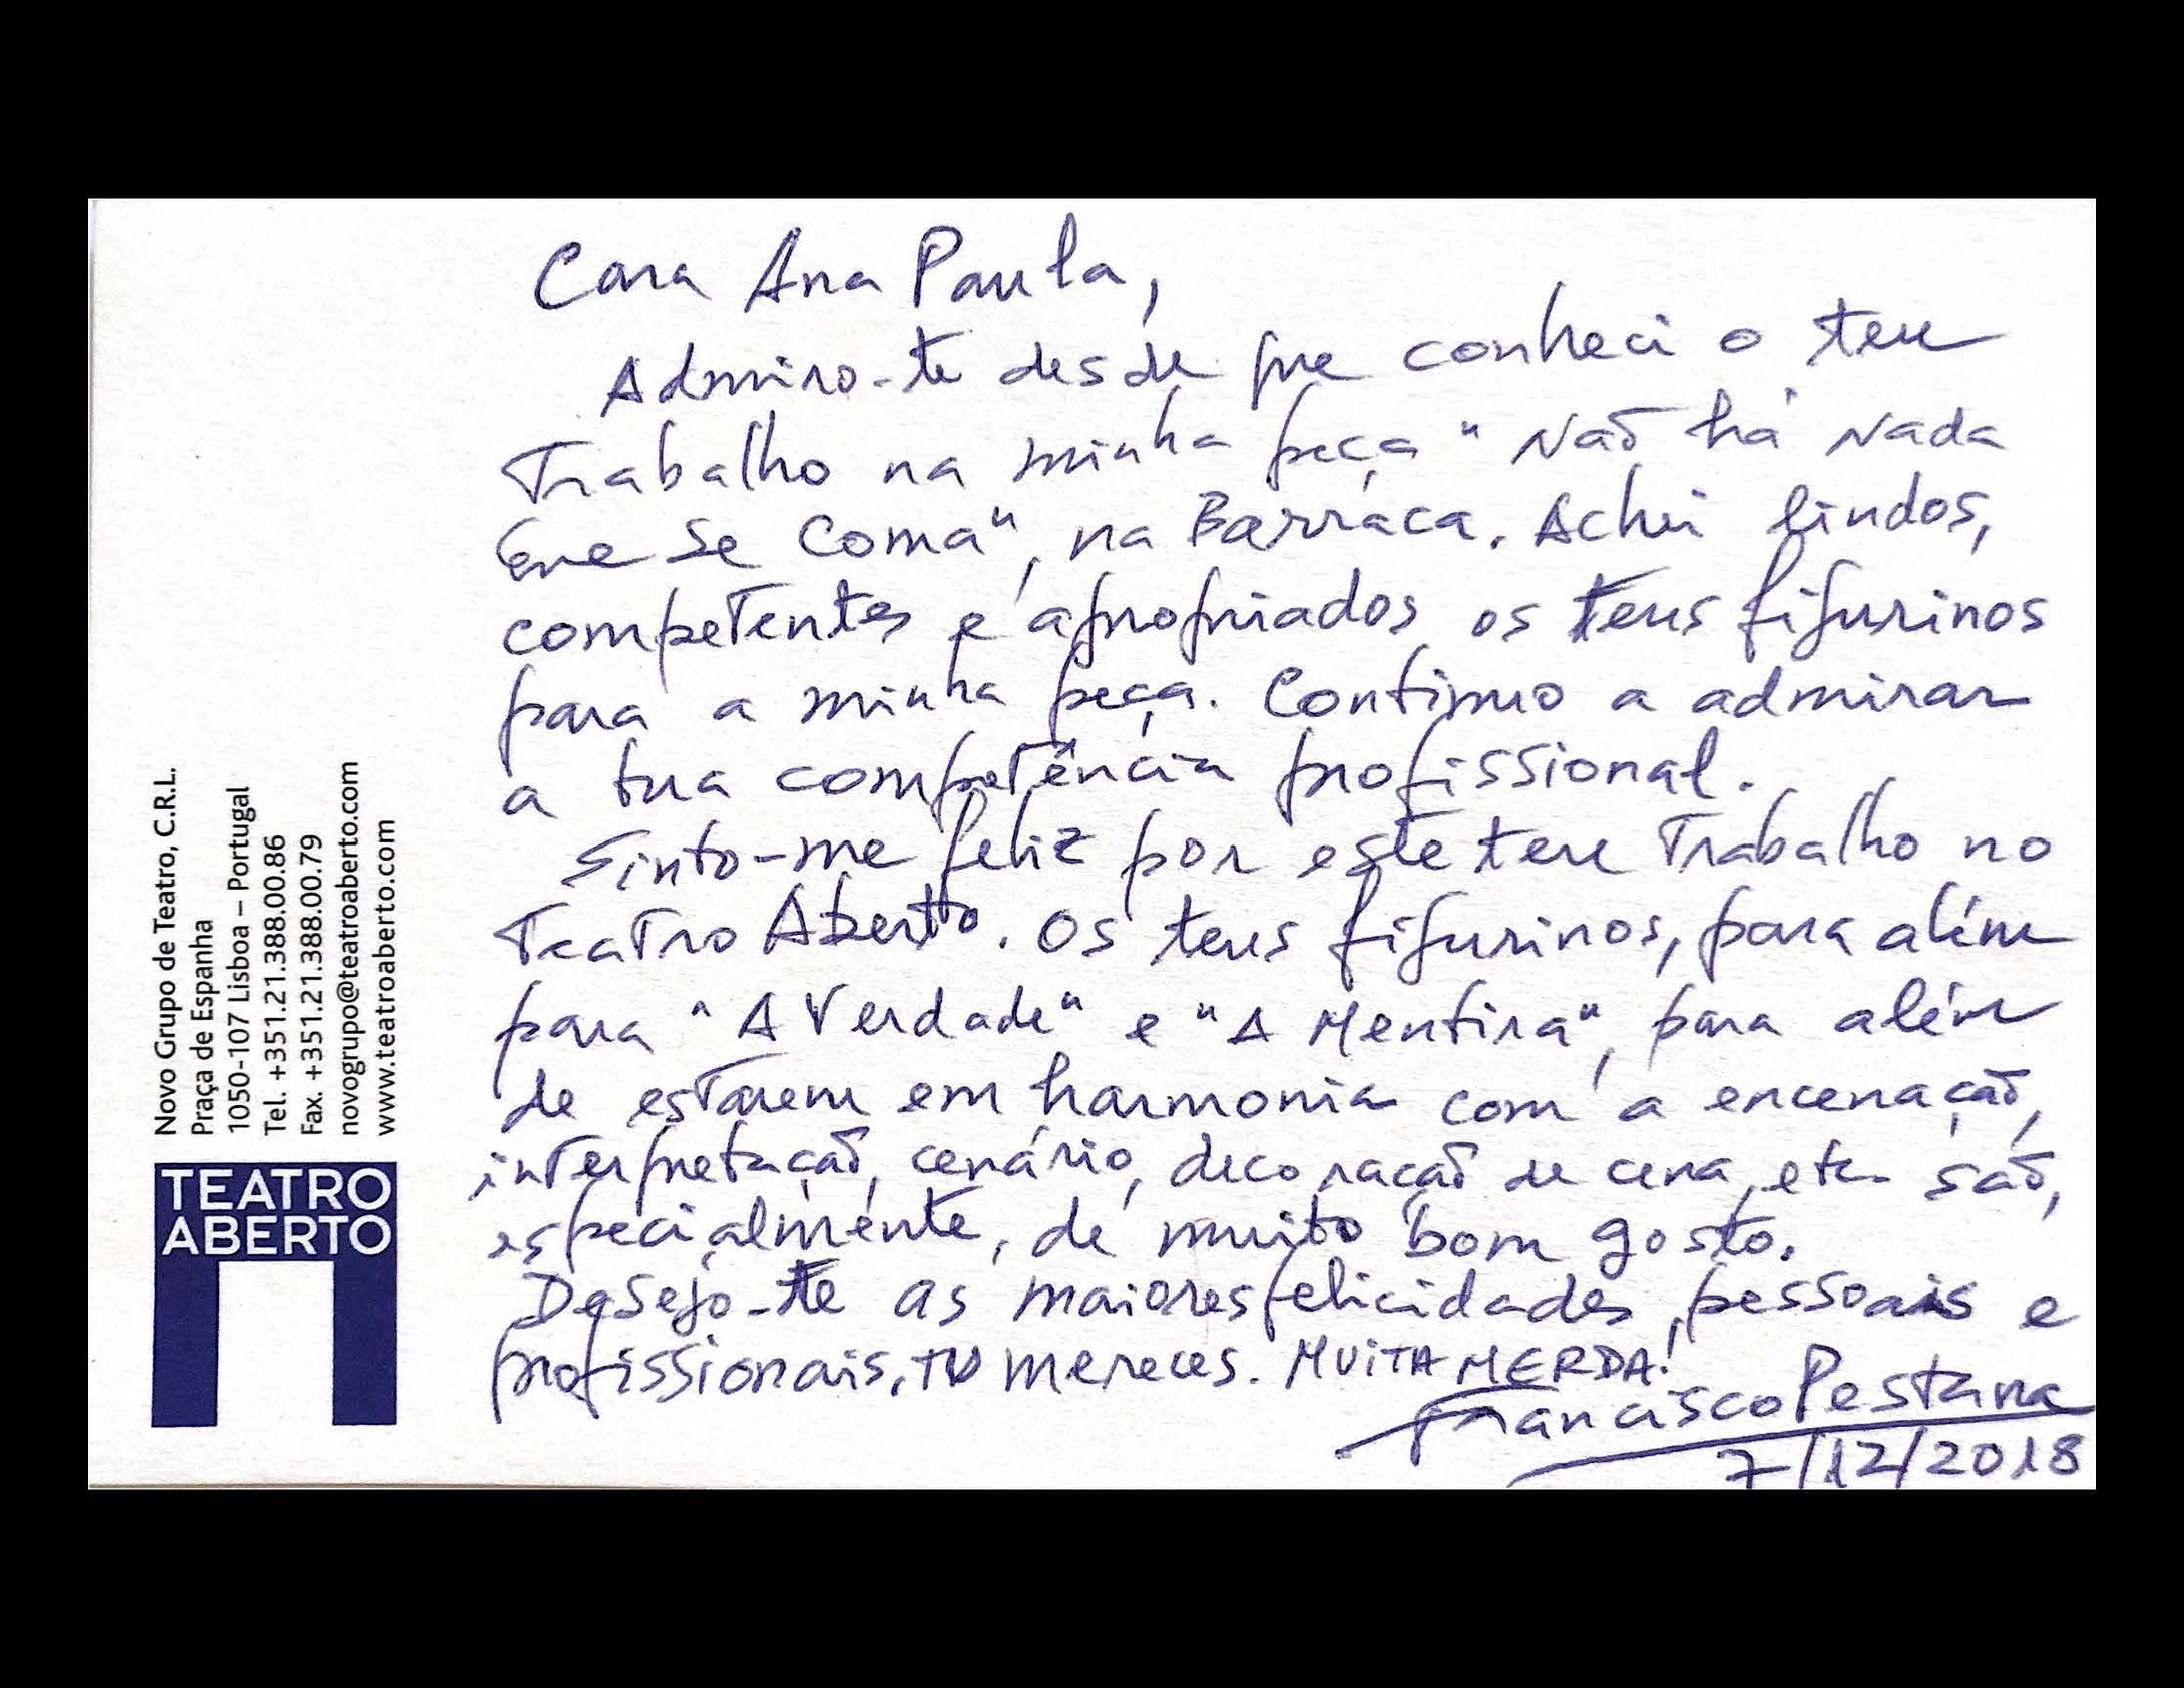 Ana Paula Rocha - Testemunhos - 025